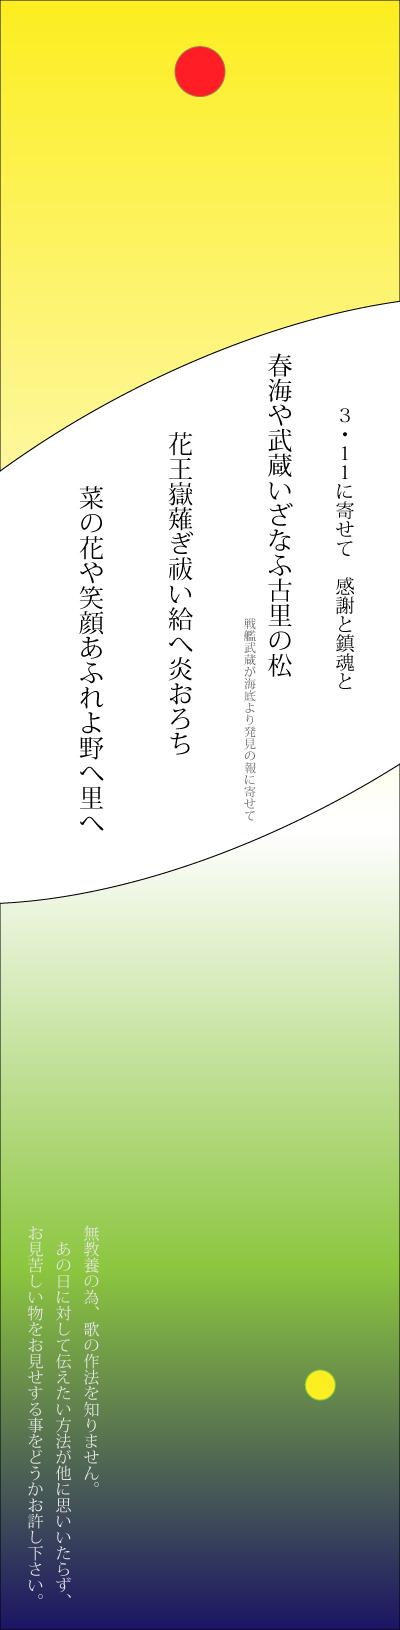 pry_1503_311.jpg